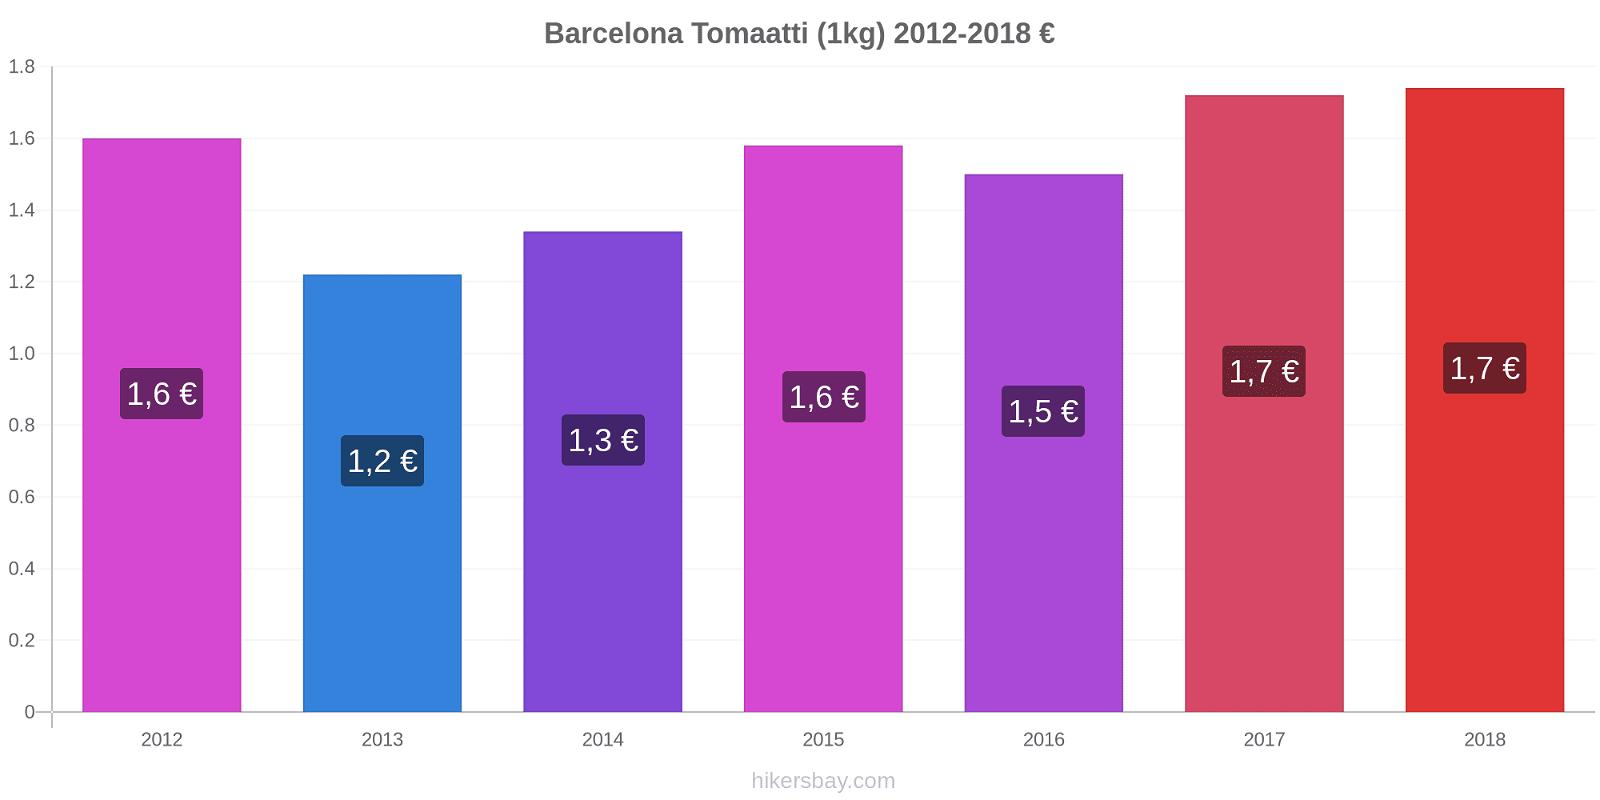 Barcelona hintojen muutokset Tomaatti (1kg) hikersbay.com